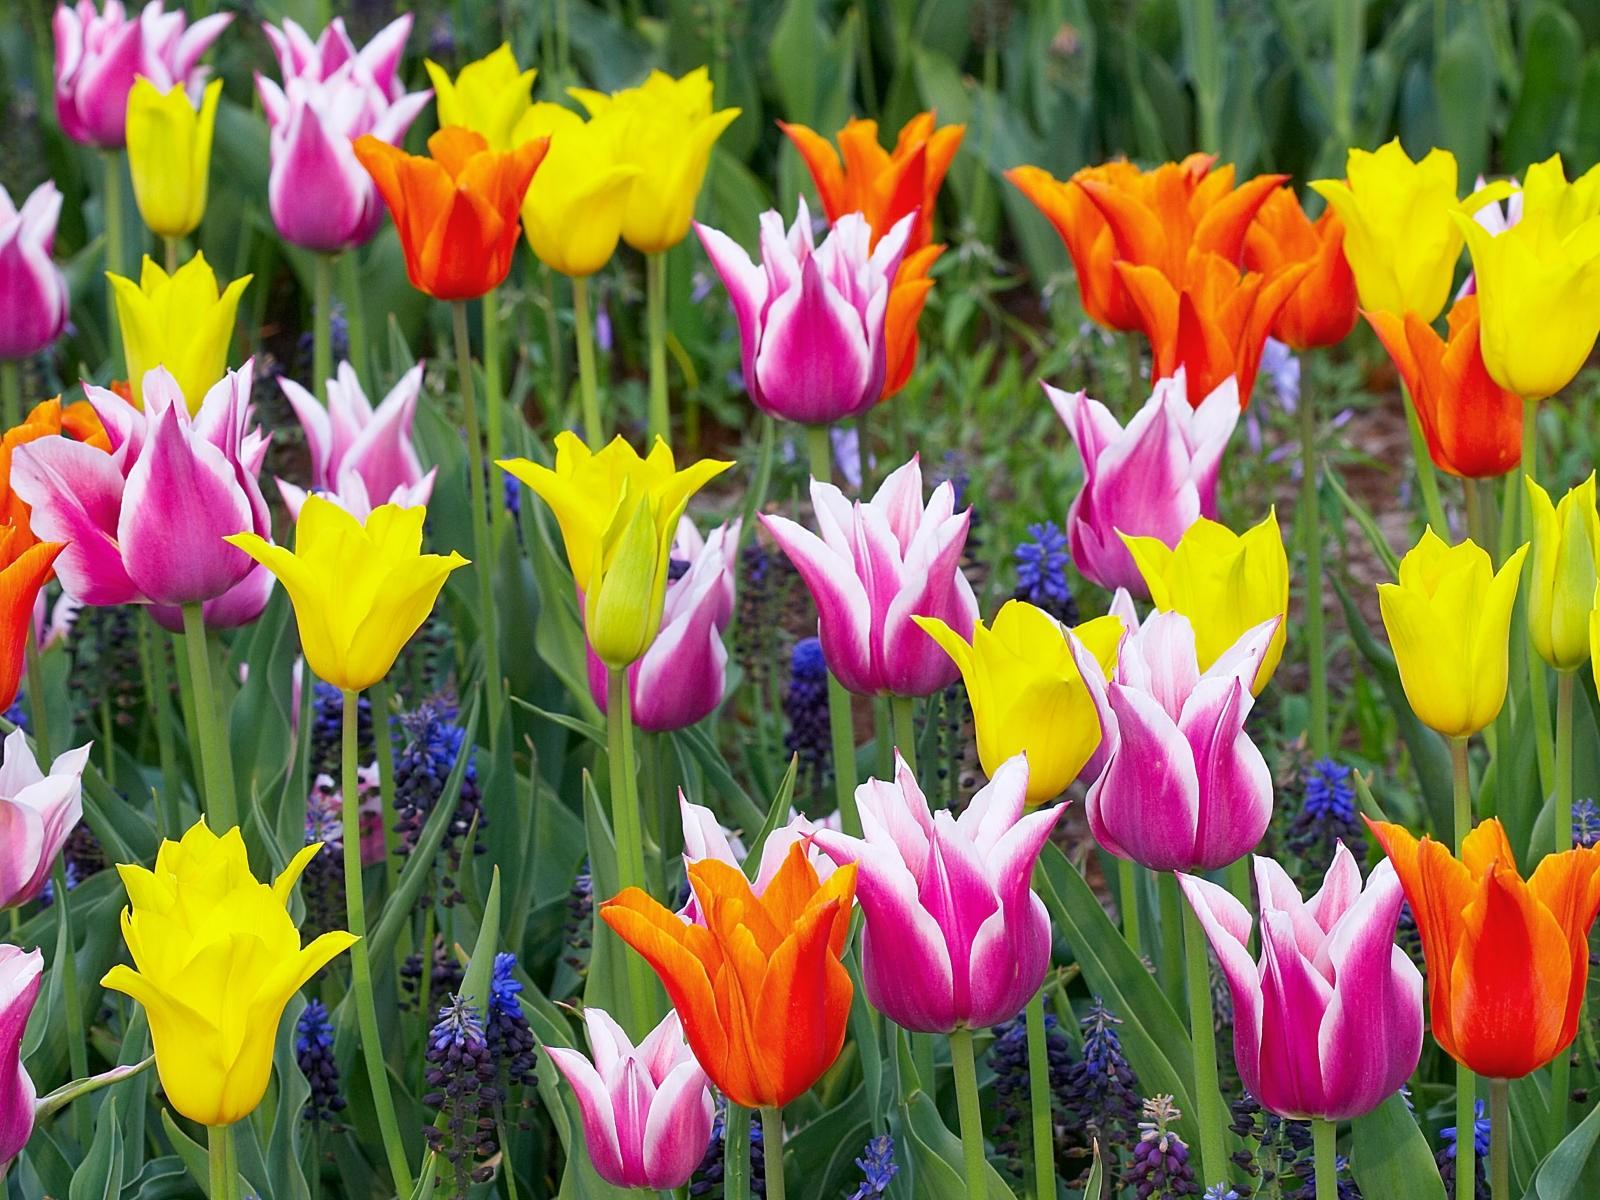 http://4.bp.blogspot.com/-XHeAULvjjc8/TZMoskMS8NI/AAAAAAAAB6Q/SwOb2ZiDfME/s1600/Colorful_Tulips_Keukenhof_Gardens_Lisse_Holland.jpg